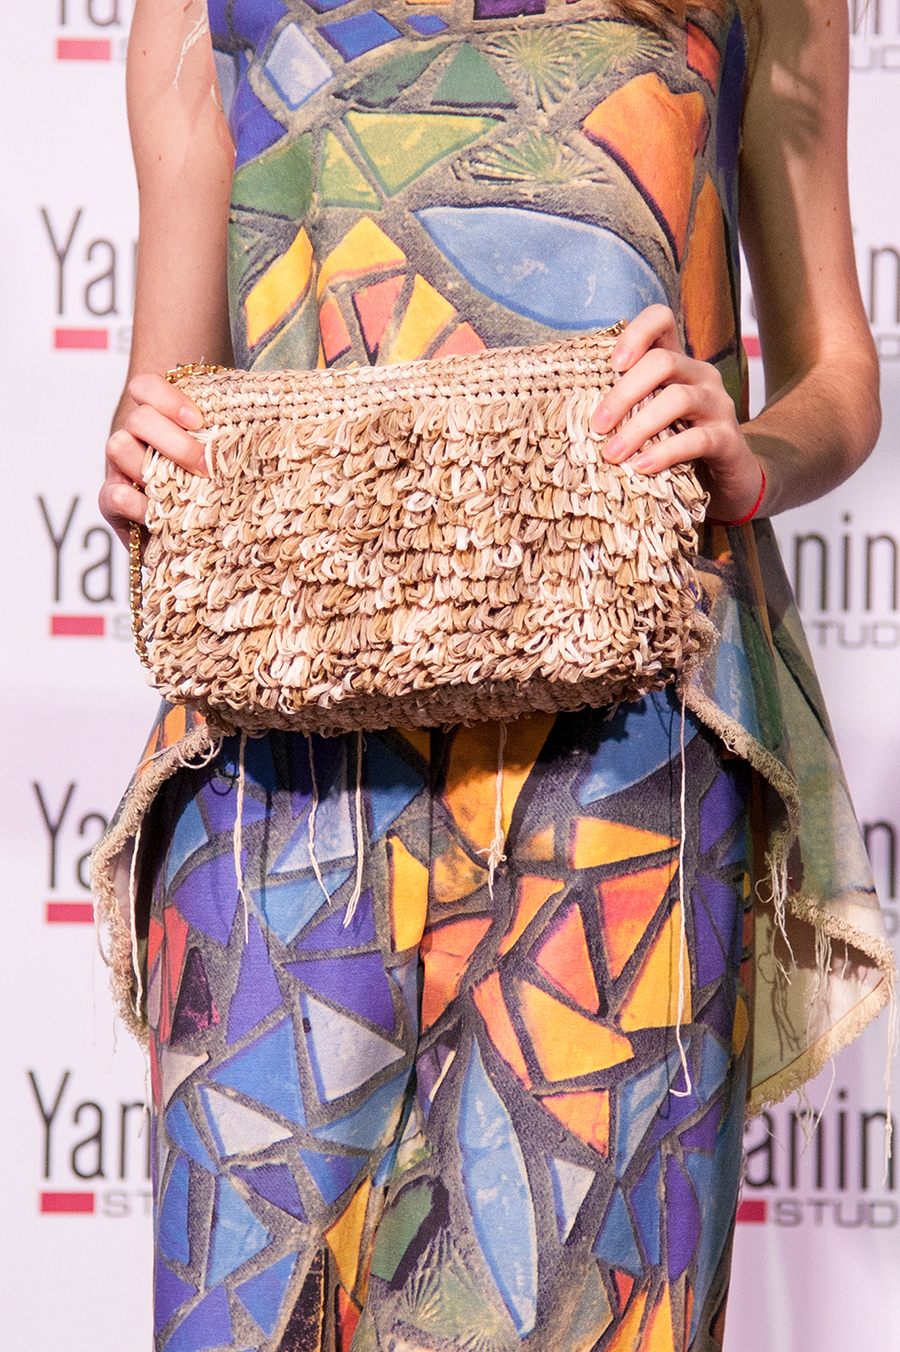 Yanina Studio